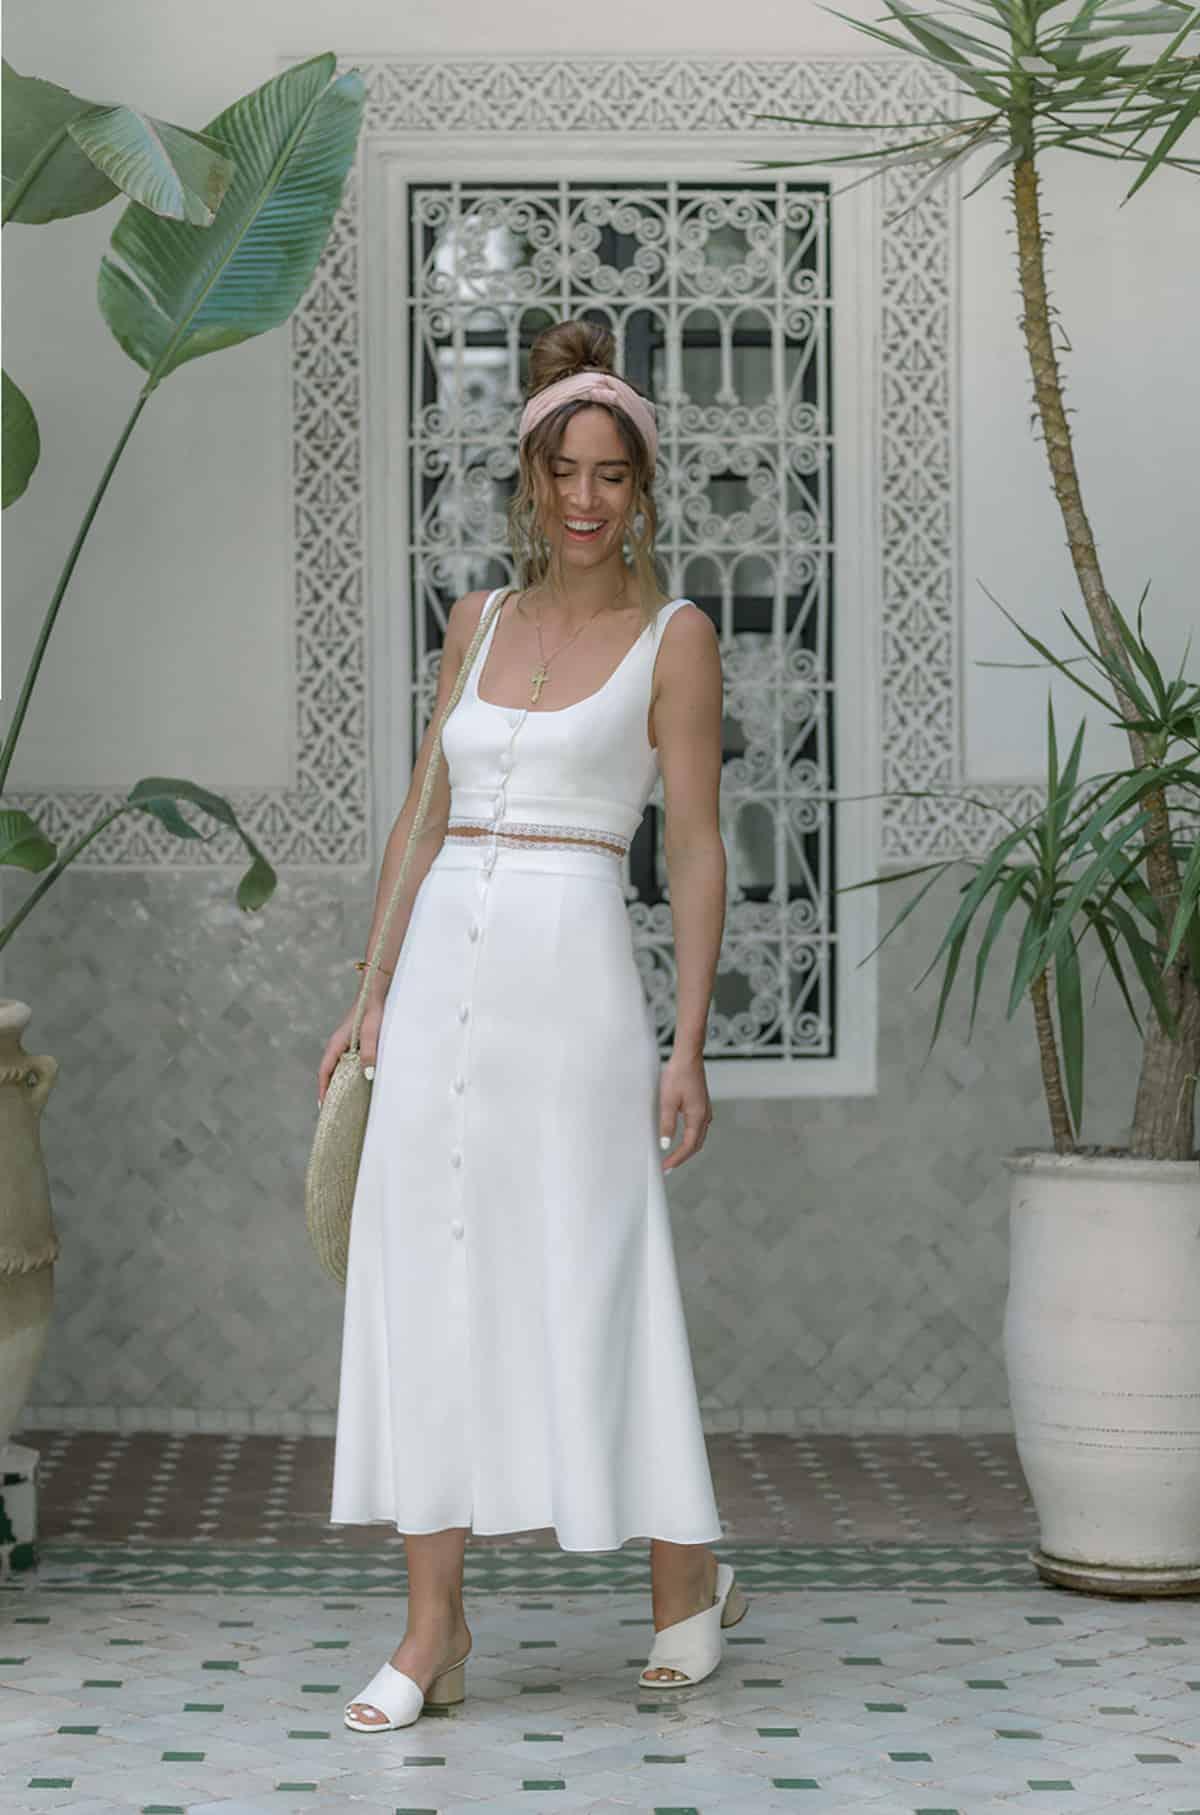 Rime_Arodaky_Marrakech_Lookbook_Greg_Finck-146